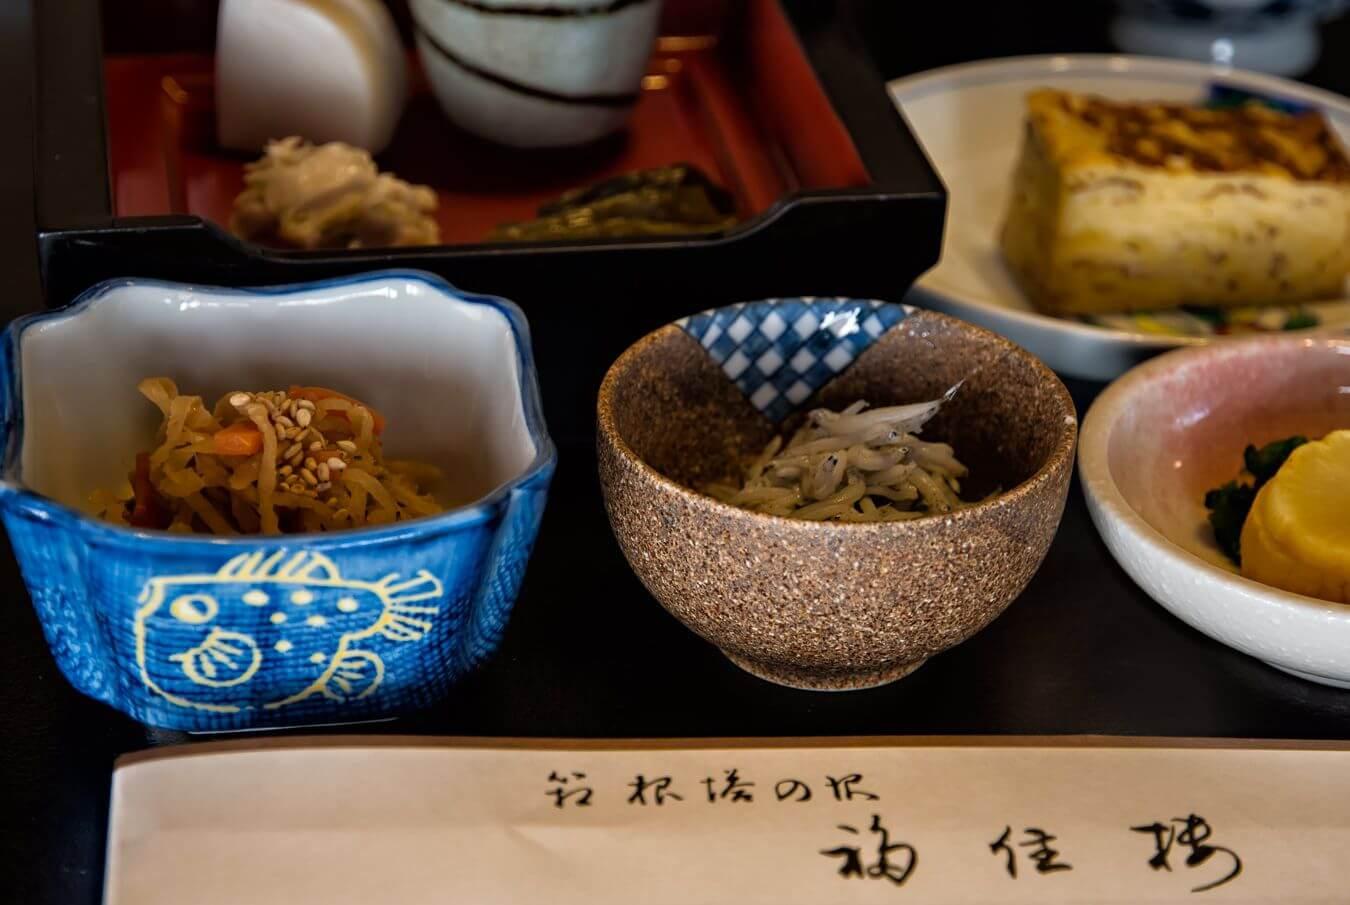 Fukuzumiro, Hakone, Kanagawa, Japan - Photo by Zed Sindelar of CuriousZed Photography